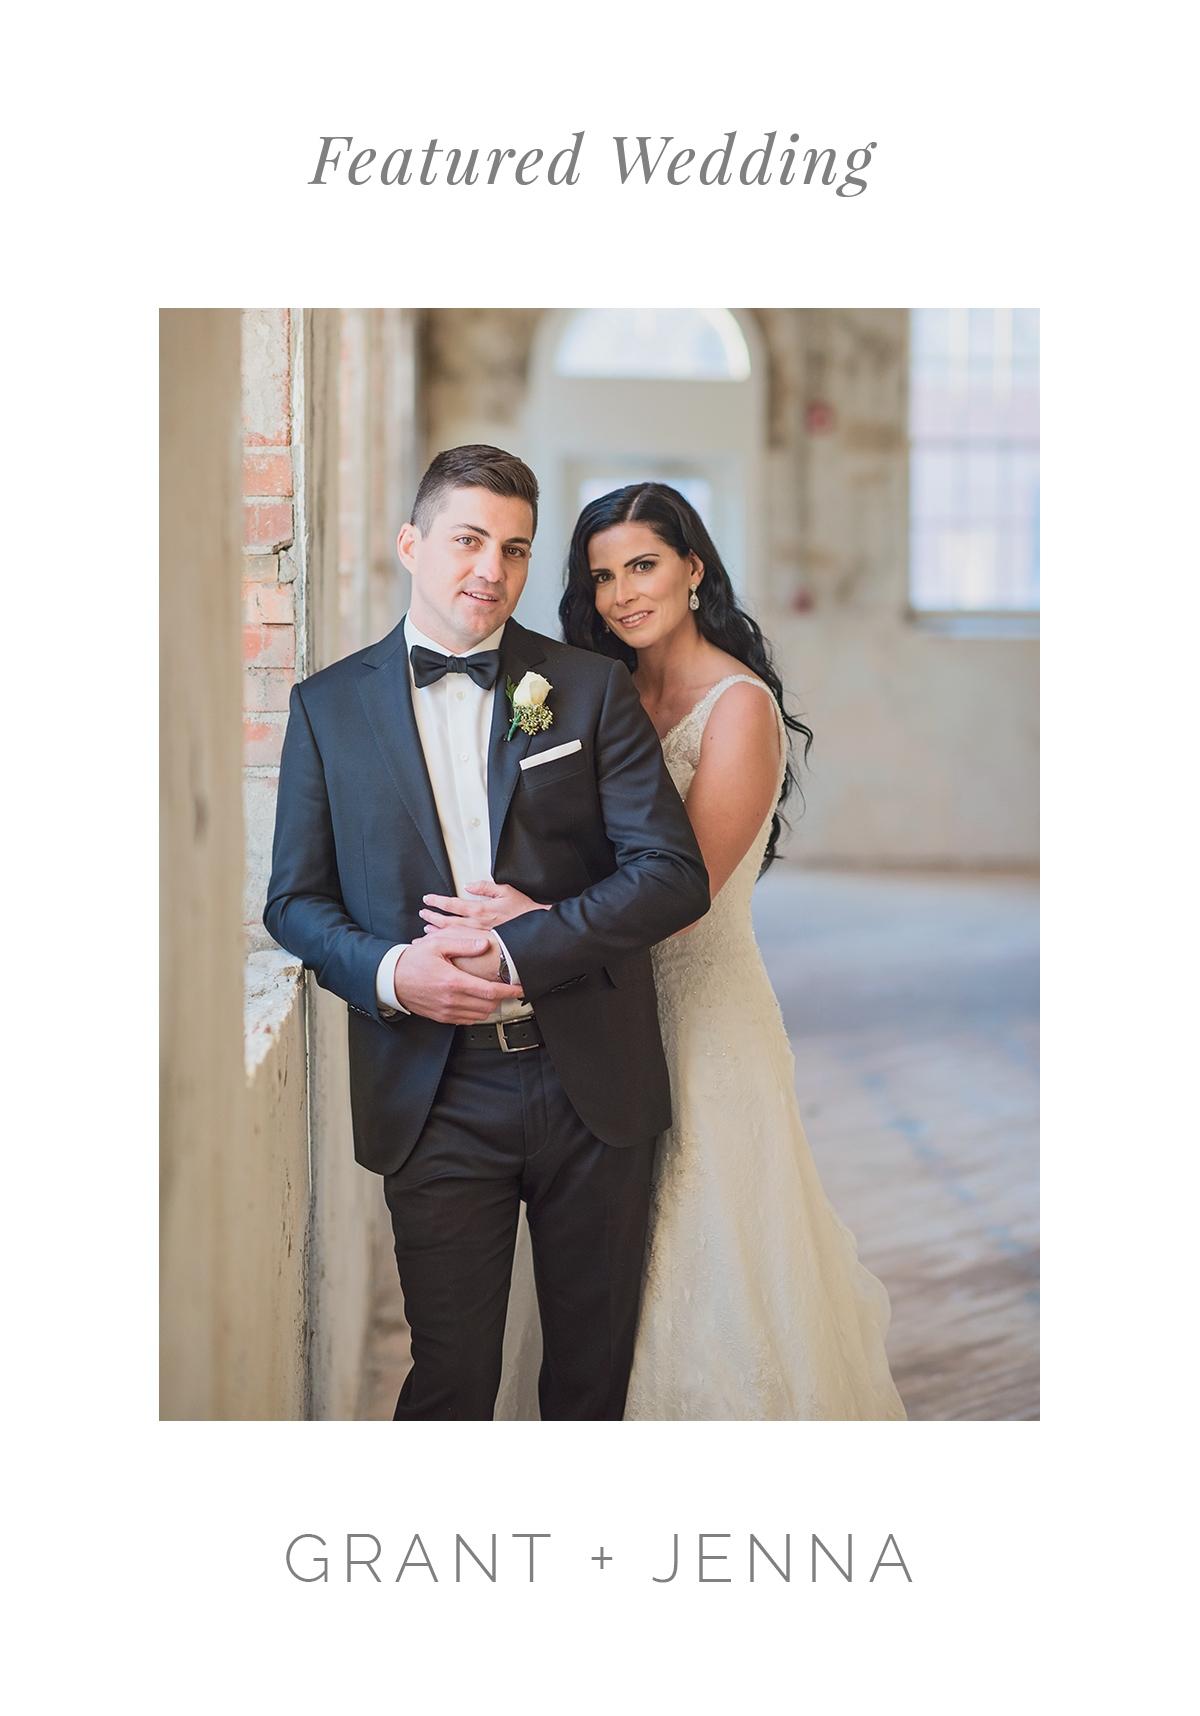 Feature.wedding.grant.jpg